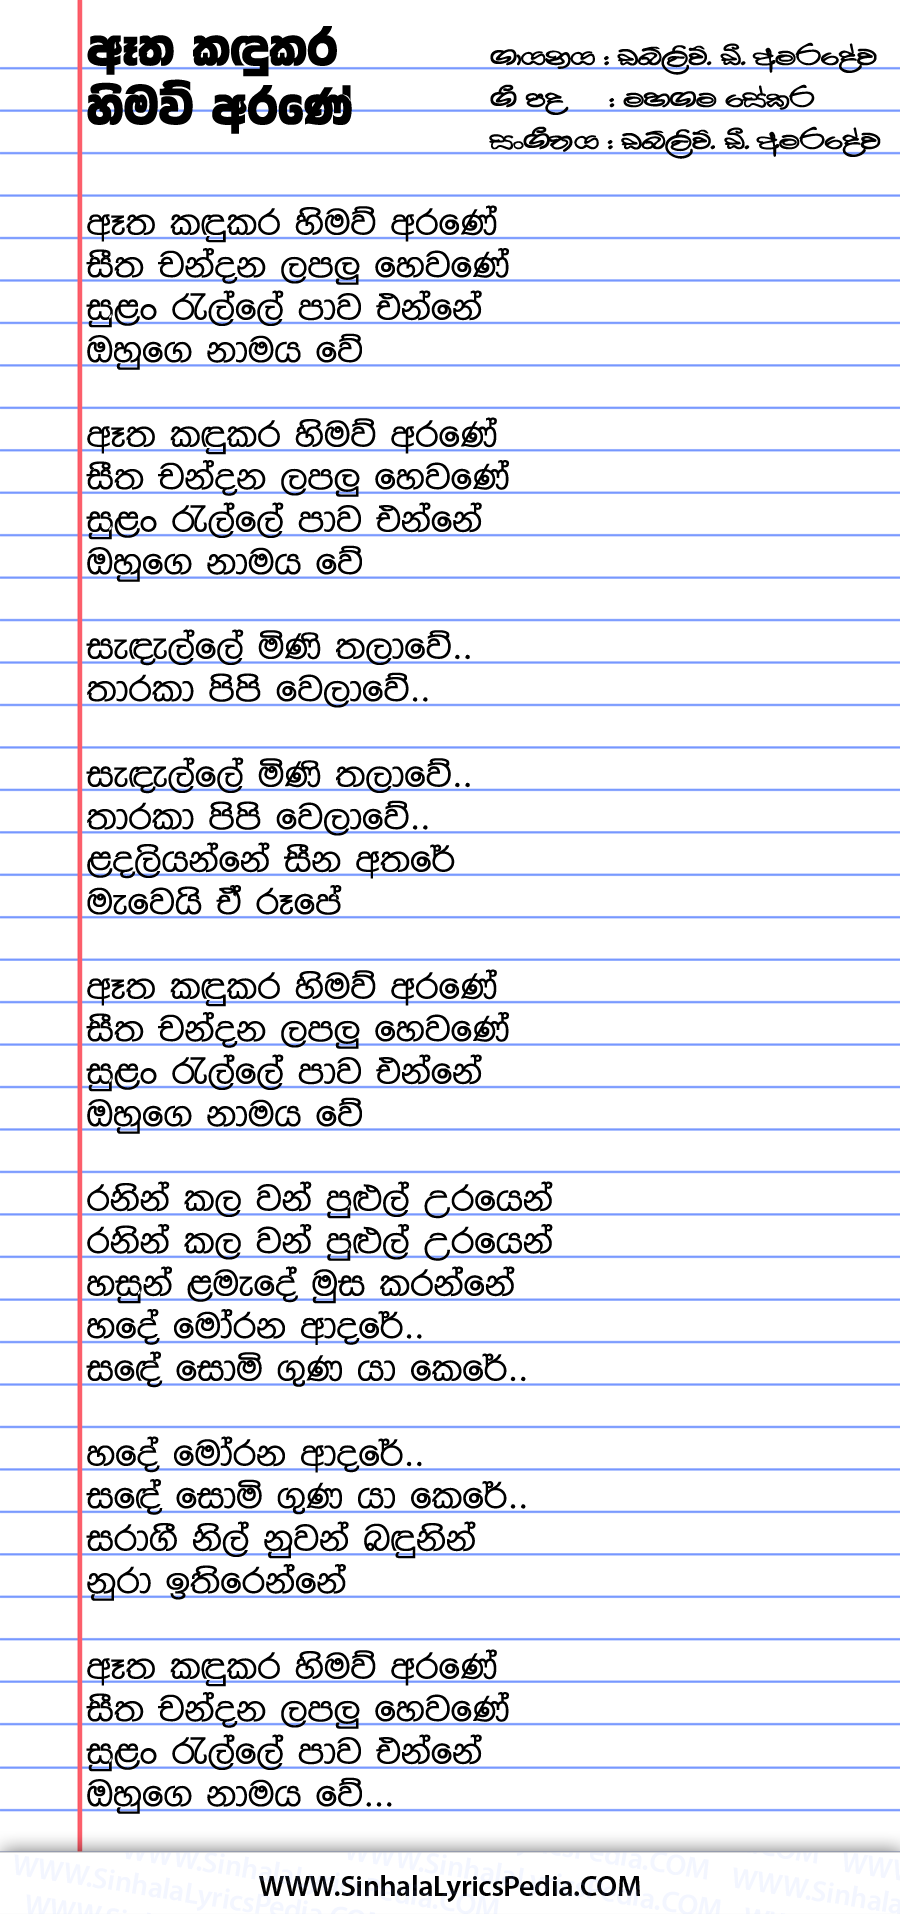 Atha Kandukara Himaw Arane Song Lyrics